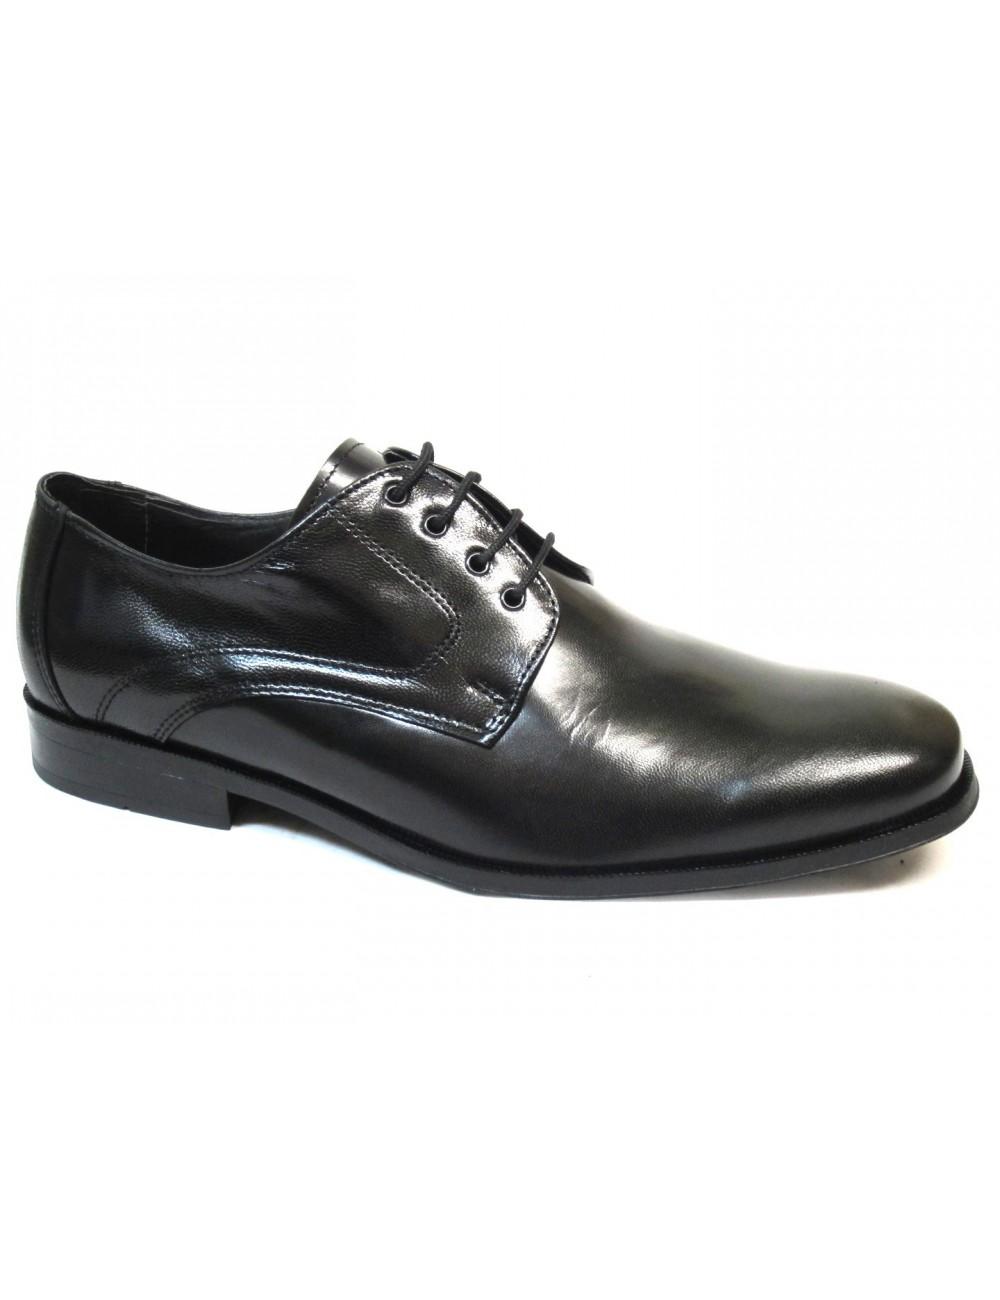 zapato Szpilman negro